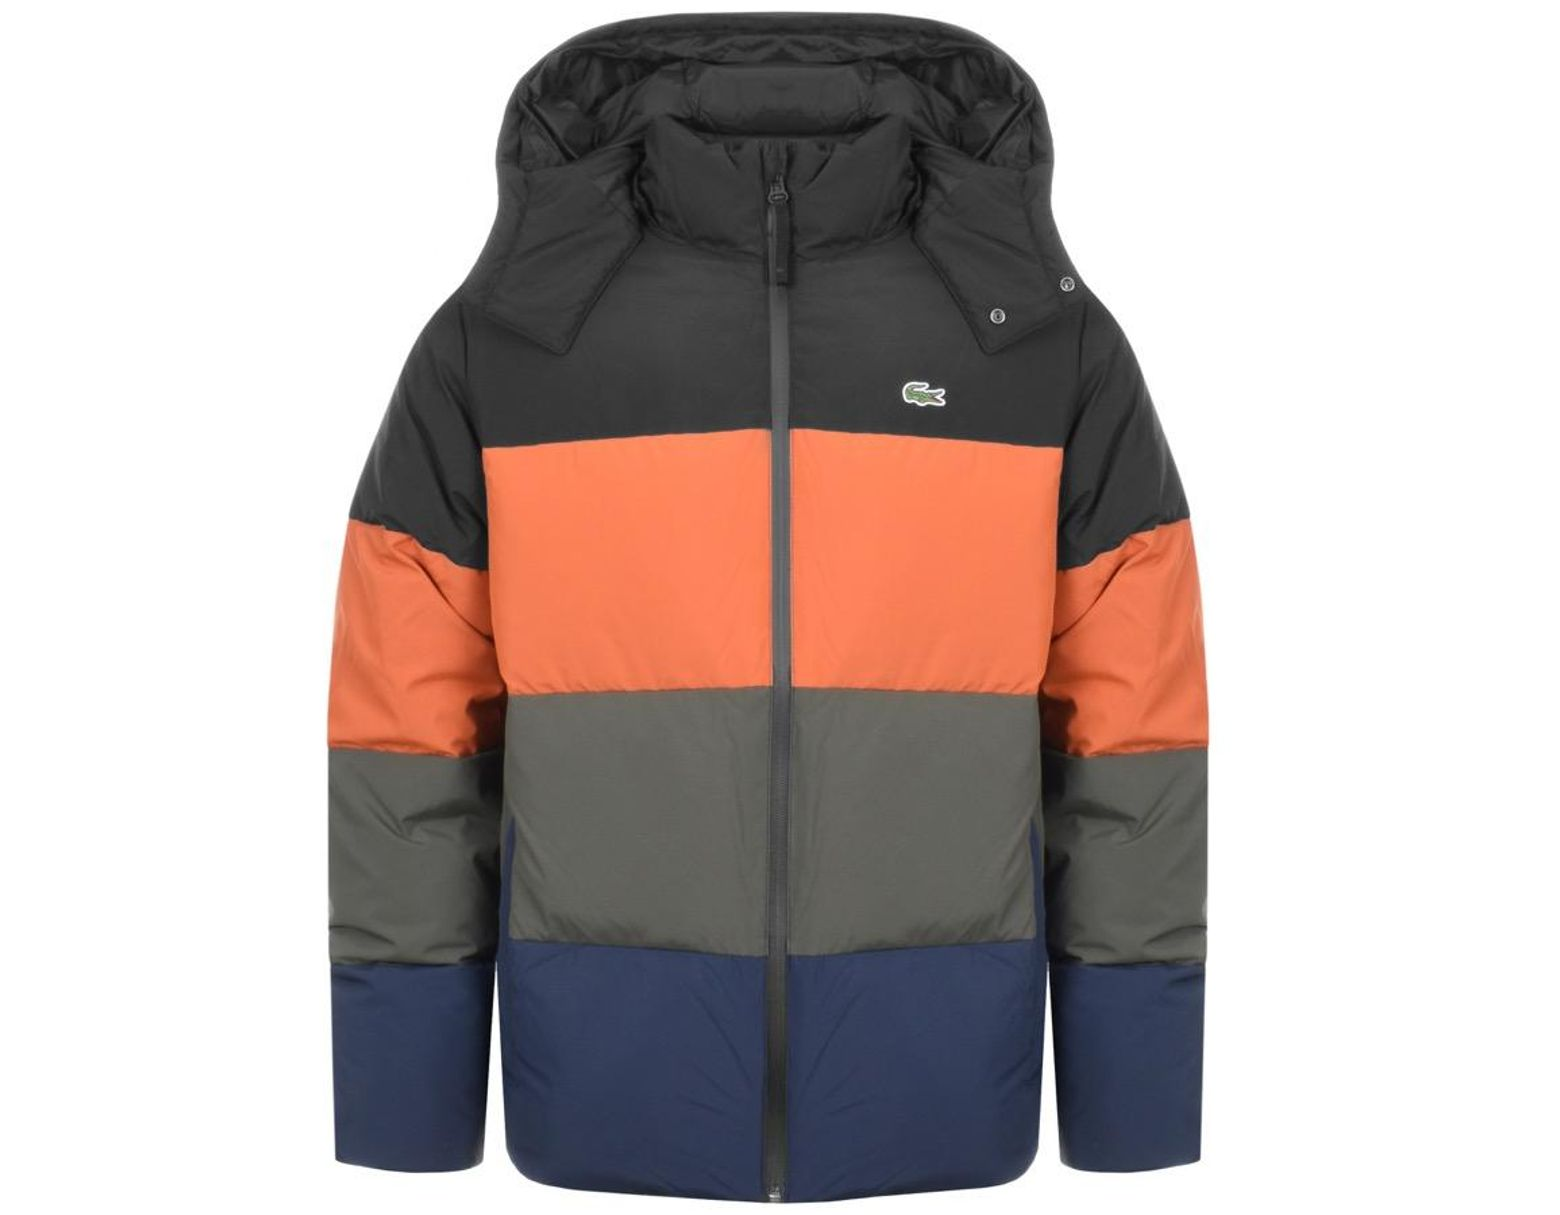 8028b80879 Lacoste Full Zip Striped Padded Jacket Black in Black for Men - Save 45% -  Lyst